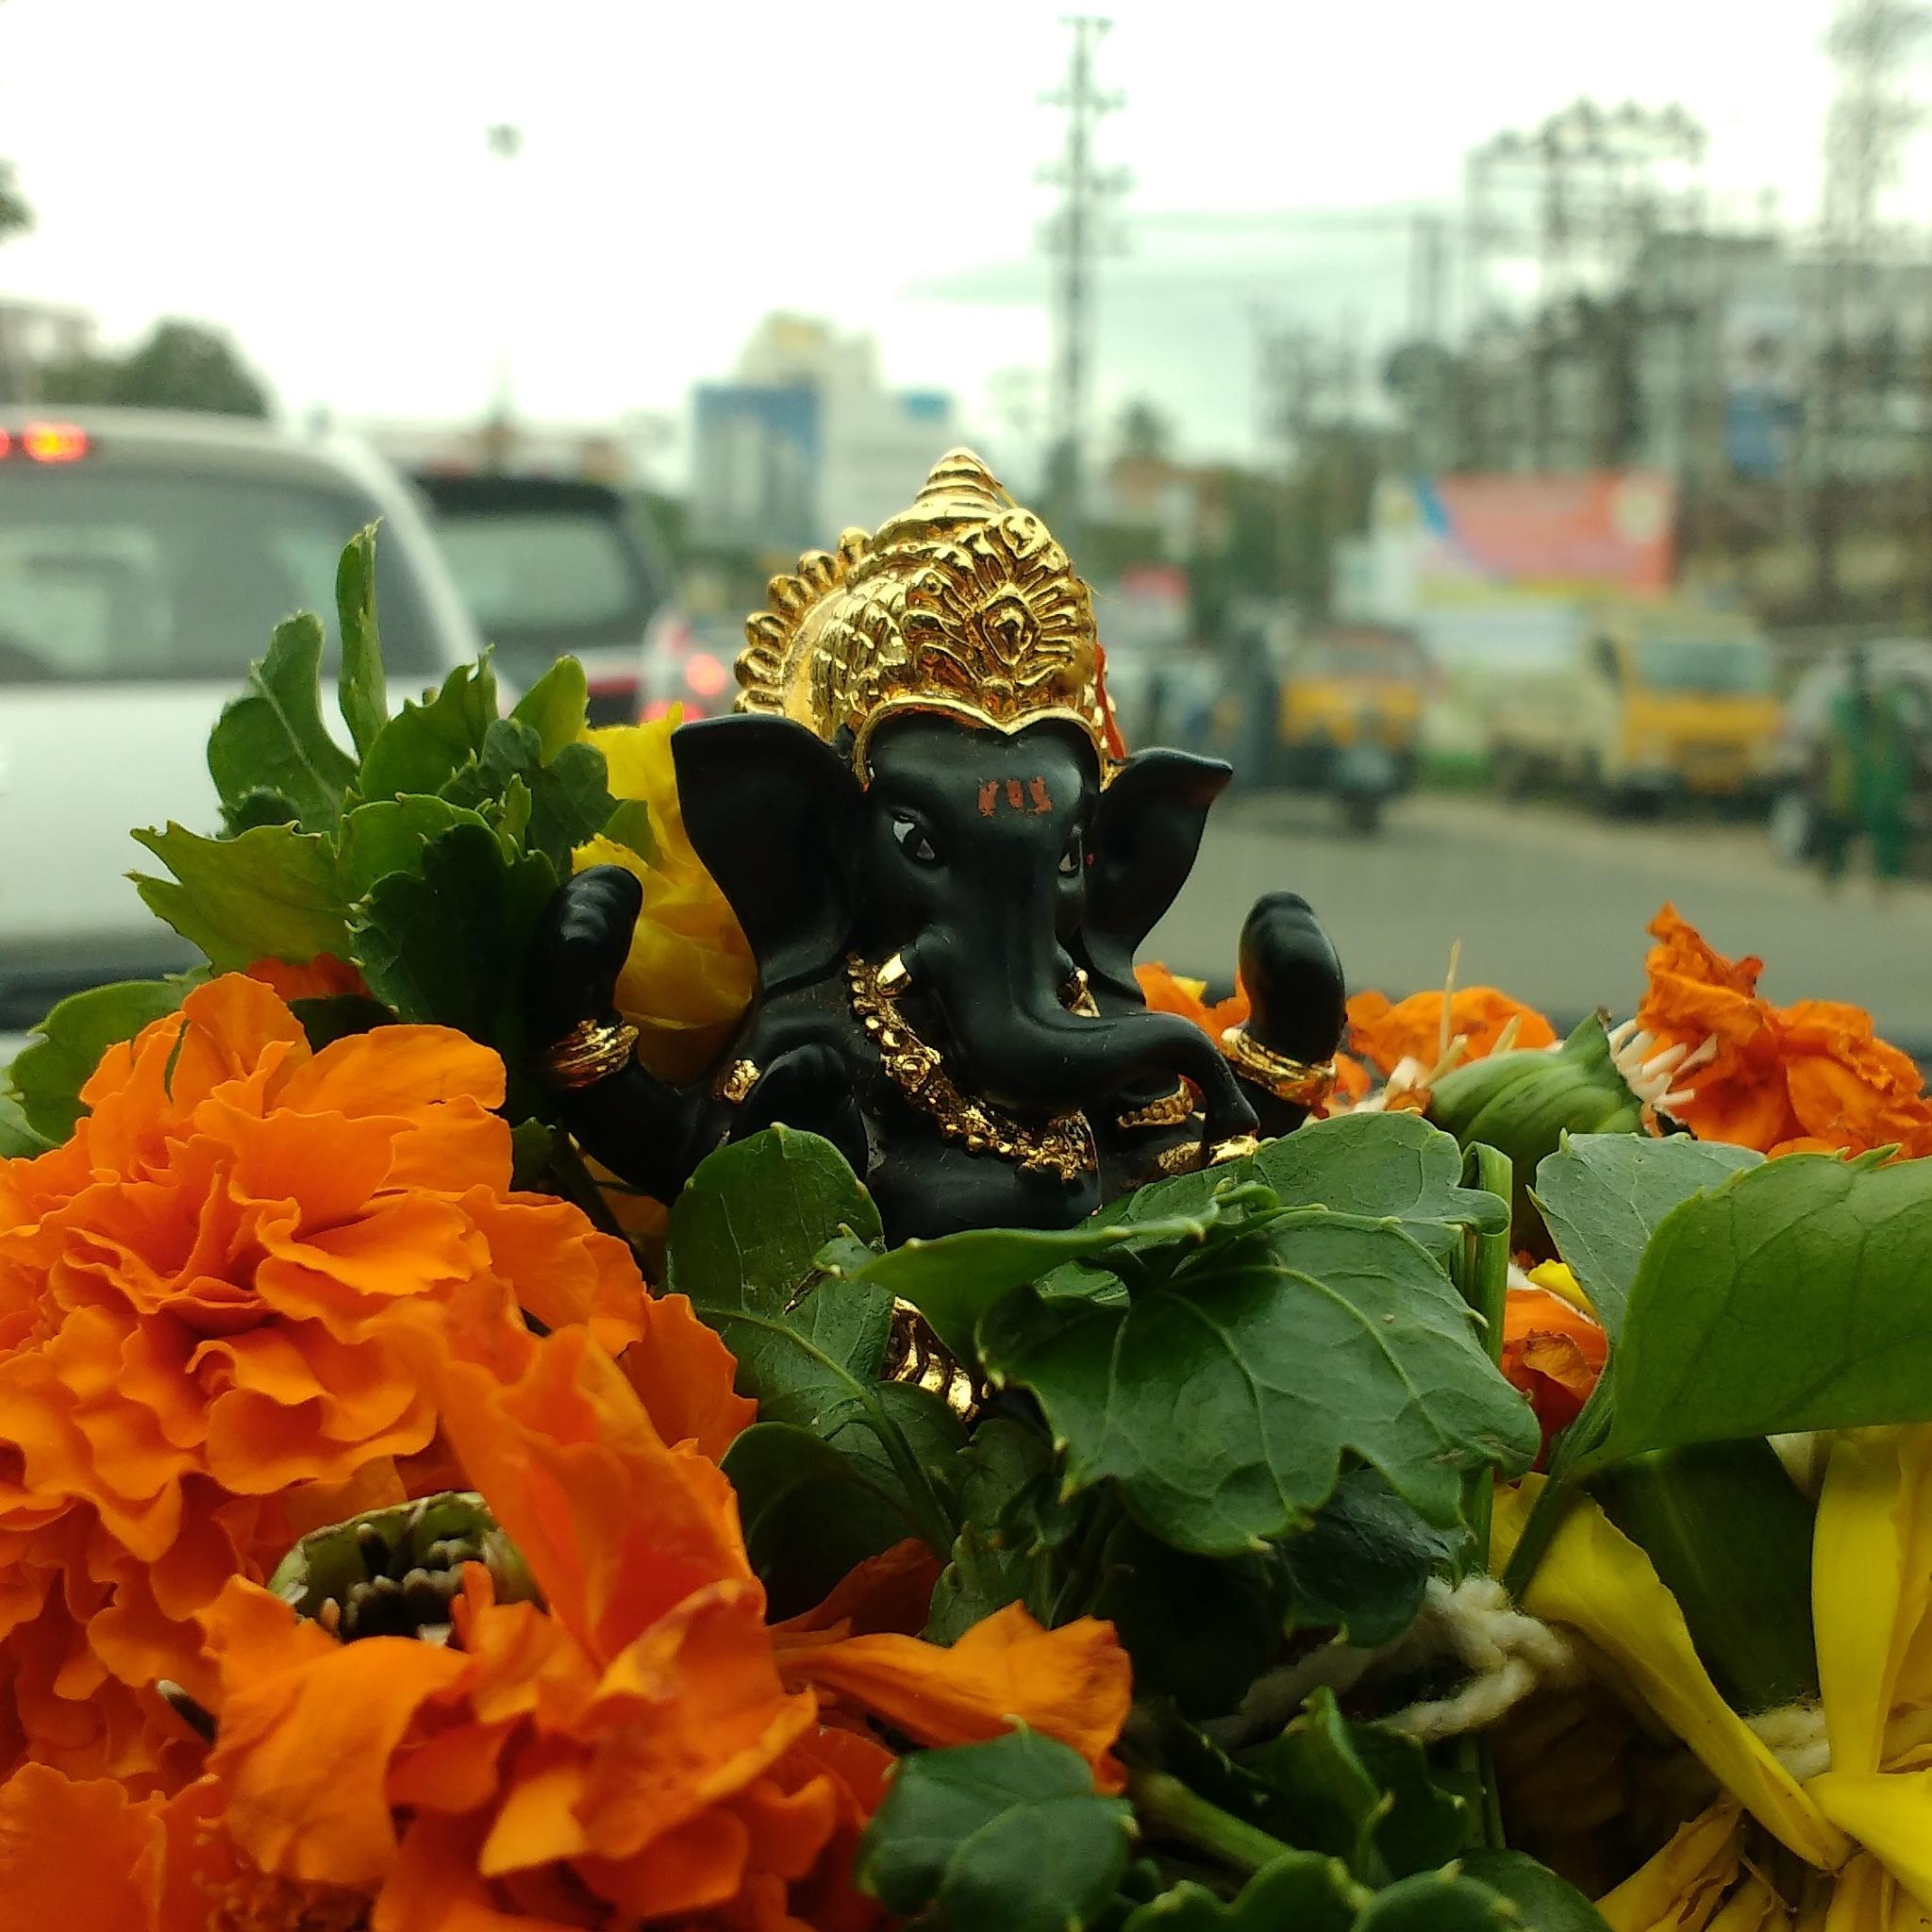 Ganesha, the elephant God by Sreeja Sreedharan